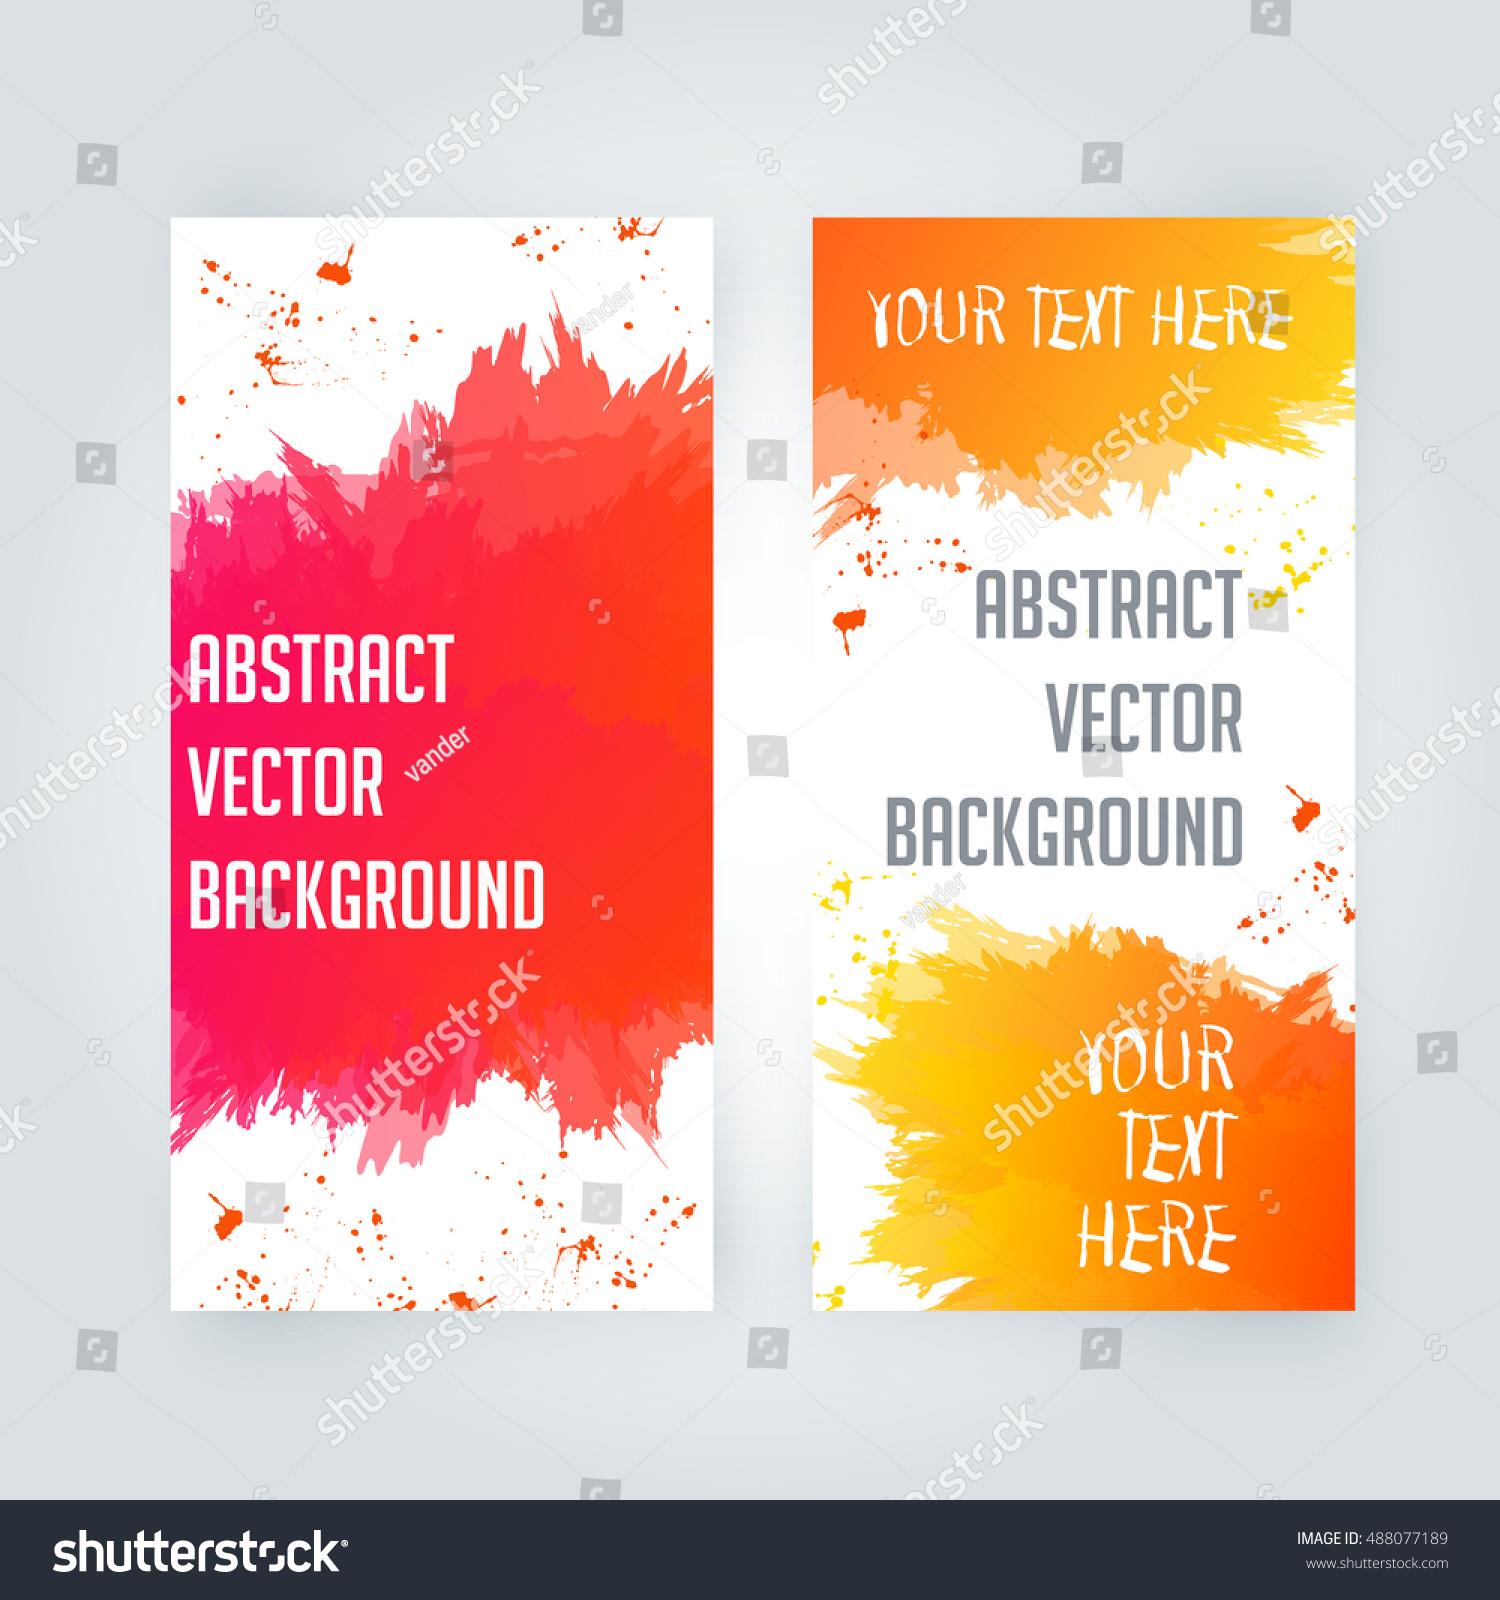 design templates vectors grunge vector resume skills examples stock vector abstract paint splashes set for design - Wwwresume Formatcom